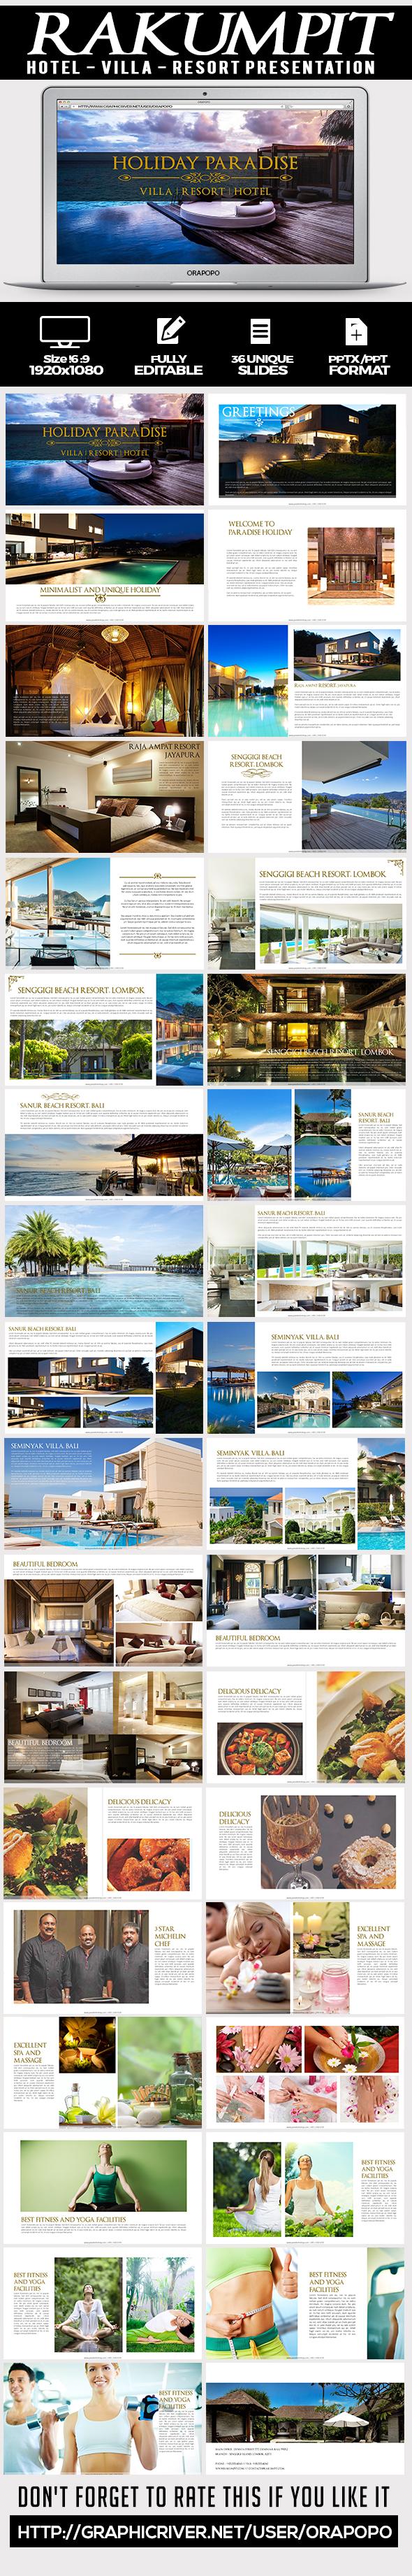 Rakumpit ~ Hotel and Resort Presentation Template  - Creative PowerPoint Templates